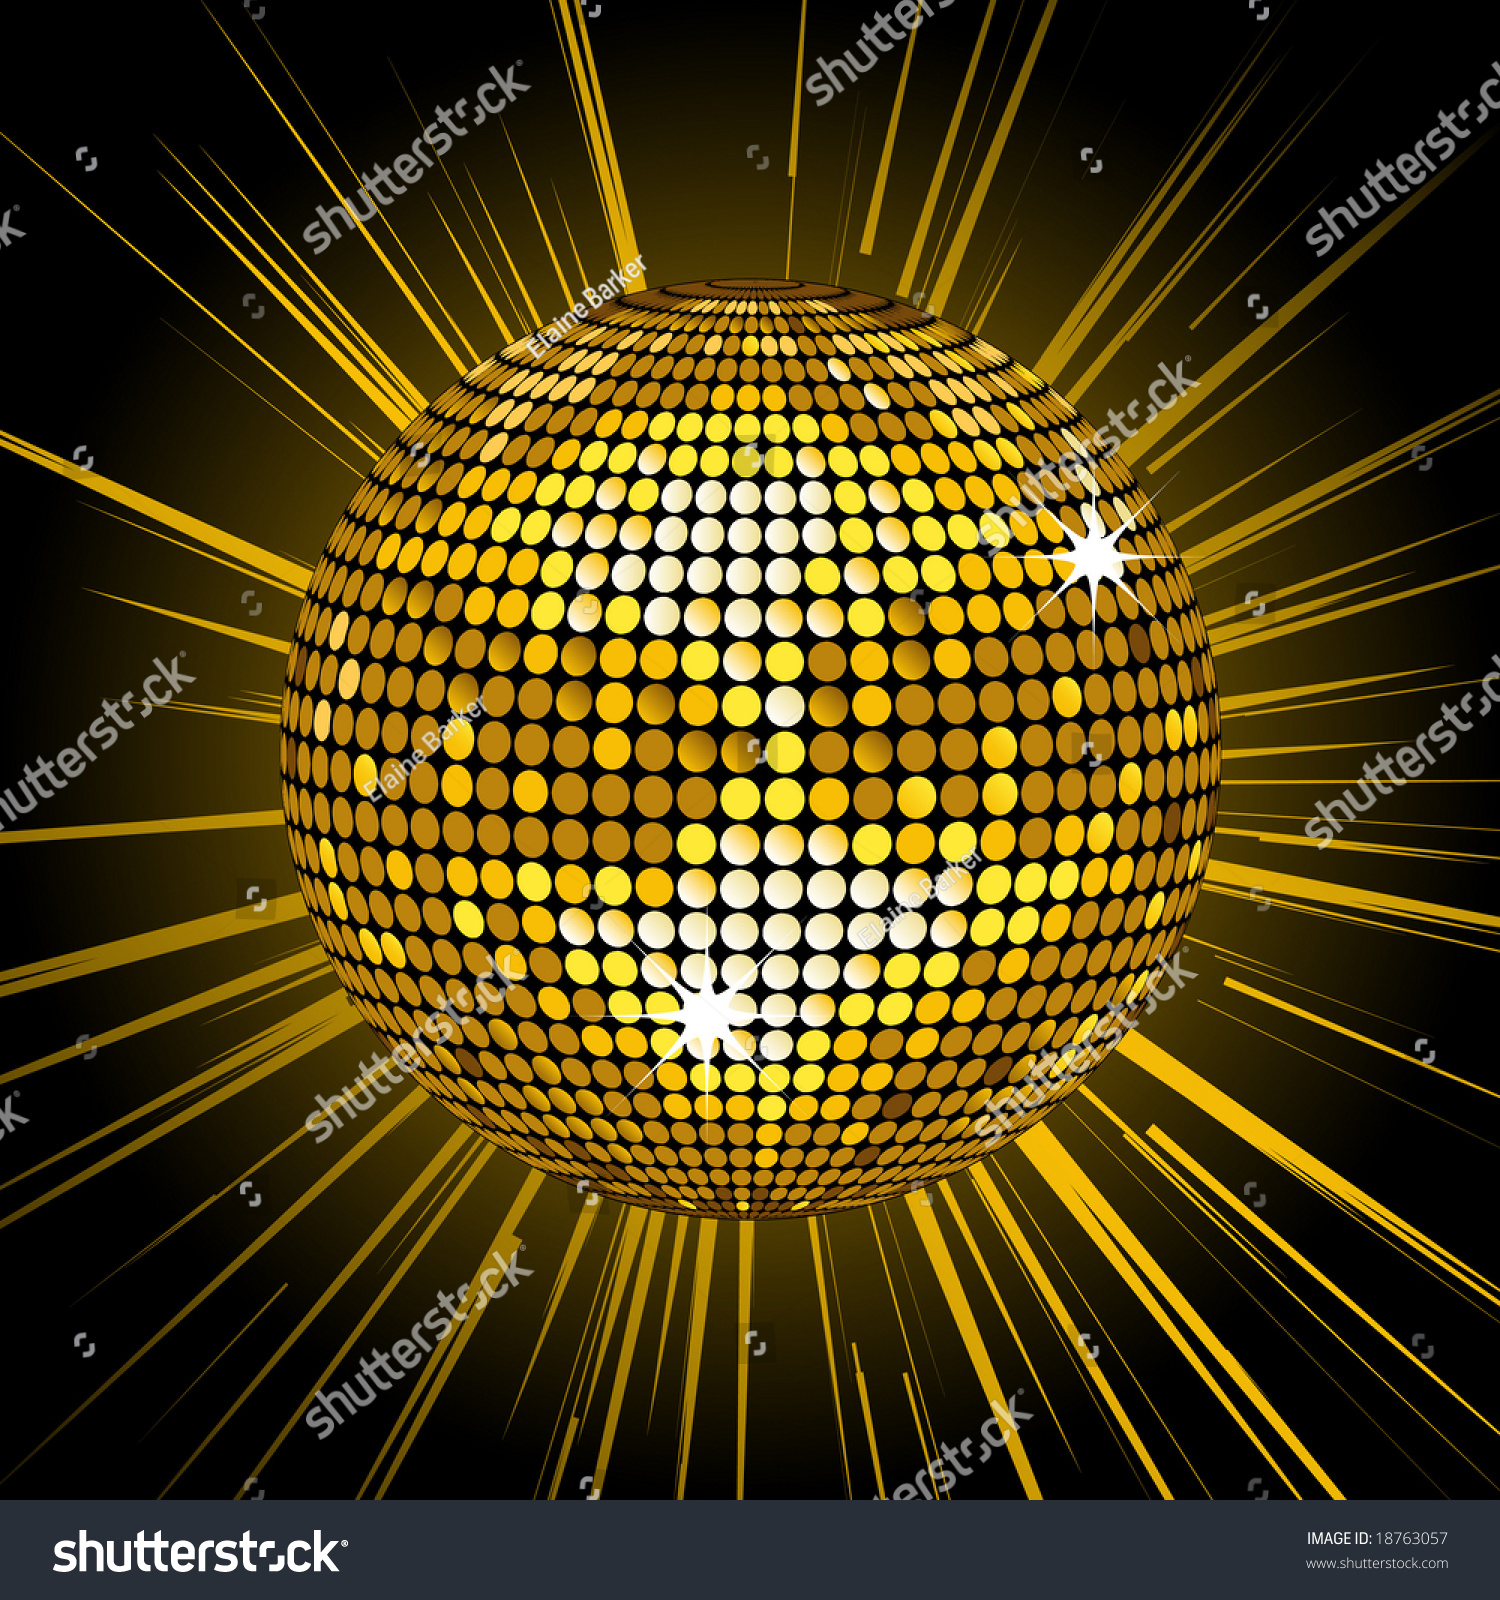 Gold Disco Ball Vector Illustration 18763057 Shutterstock